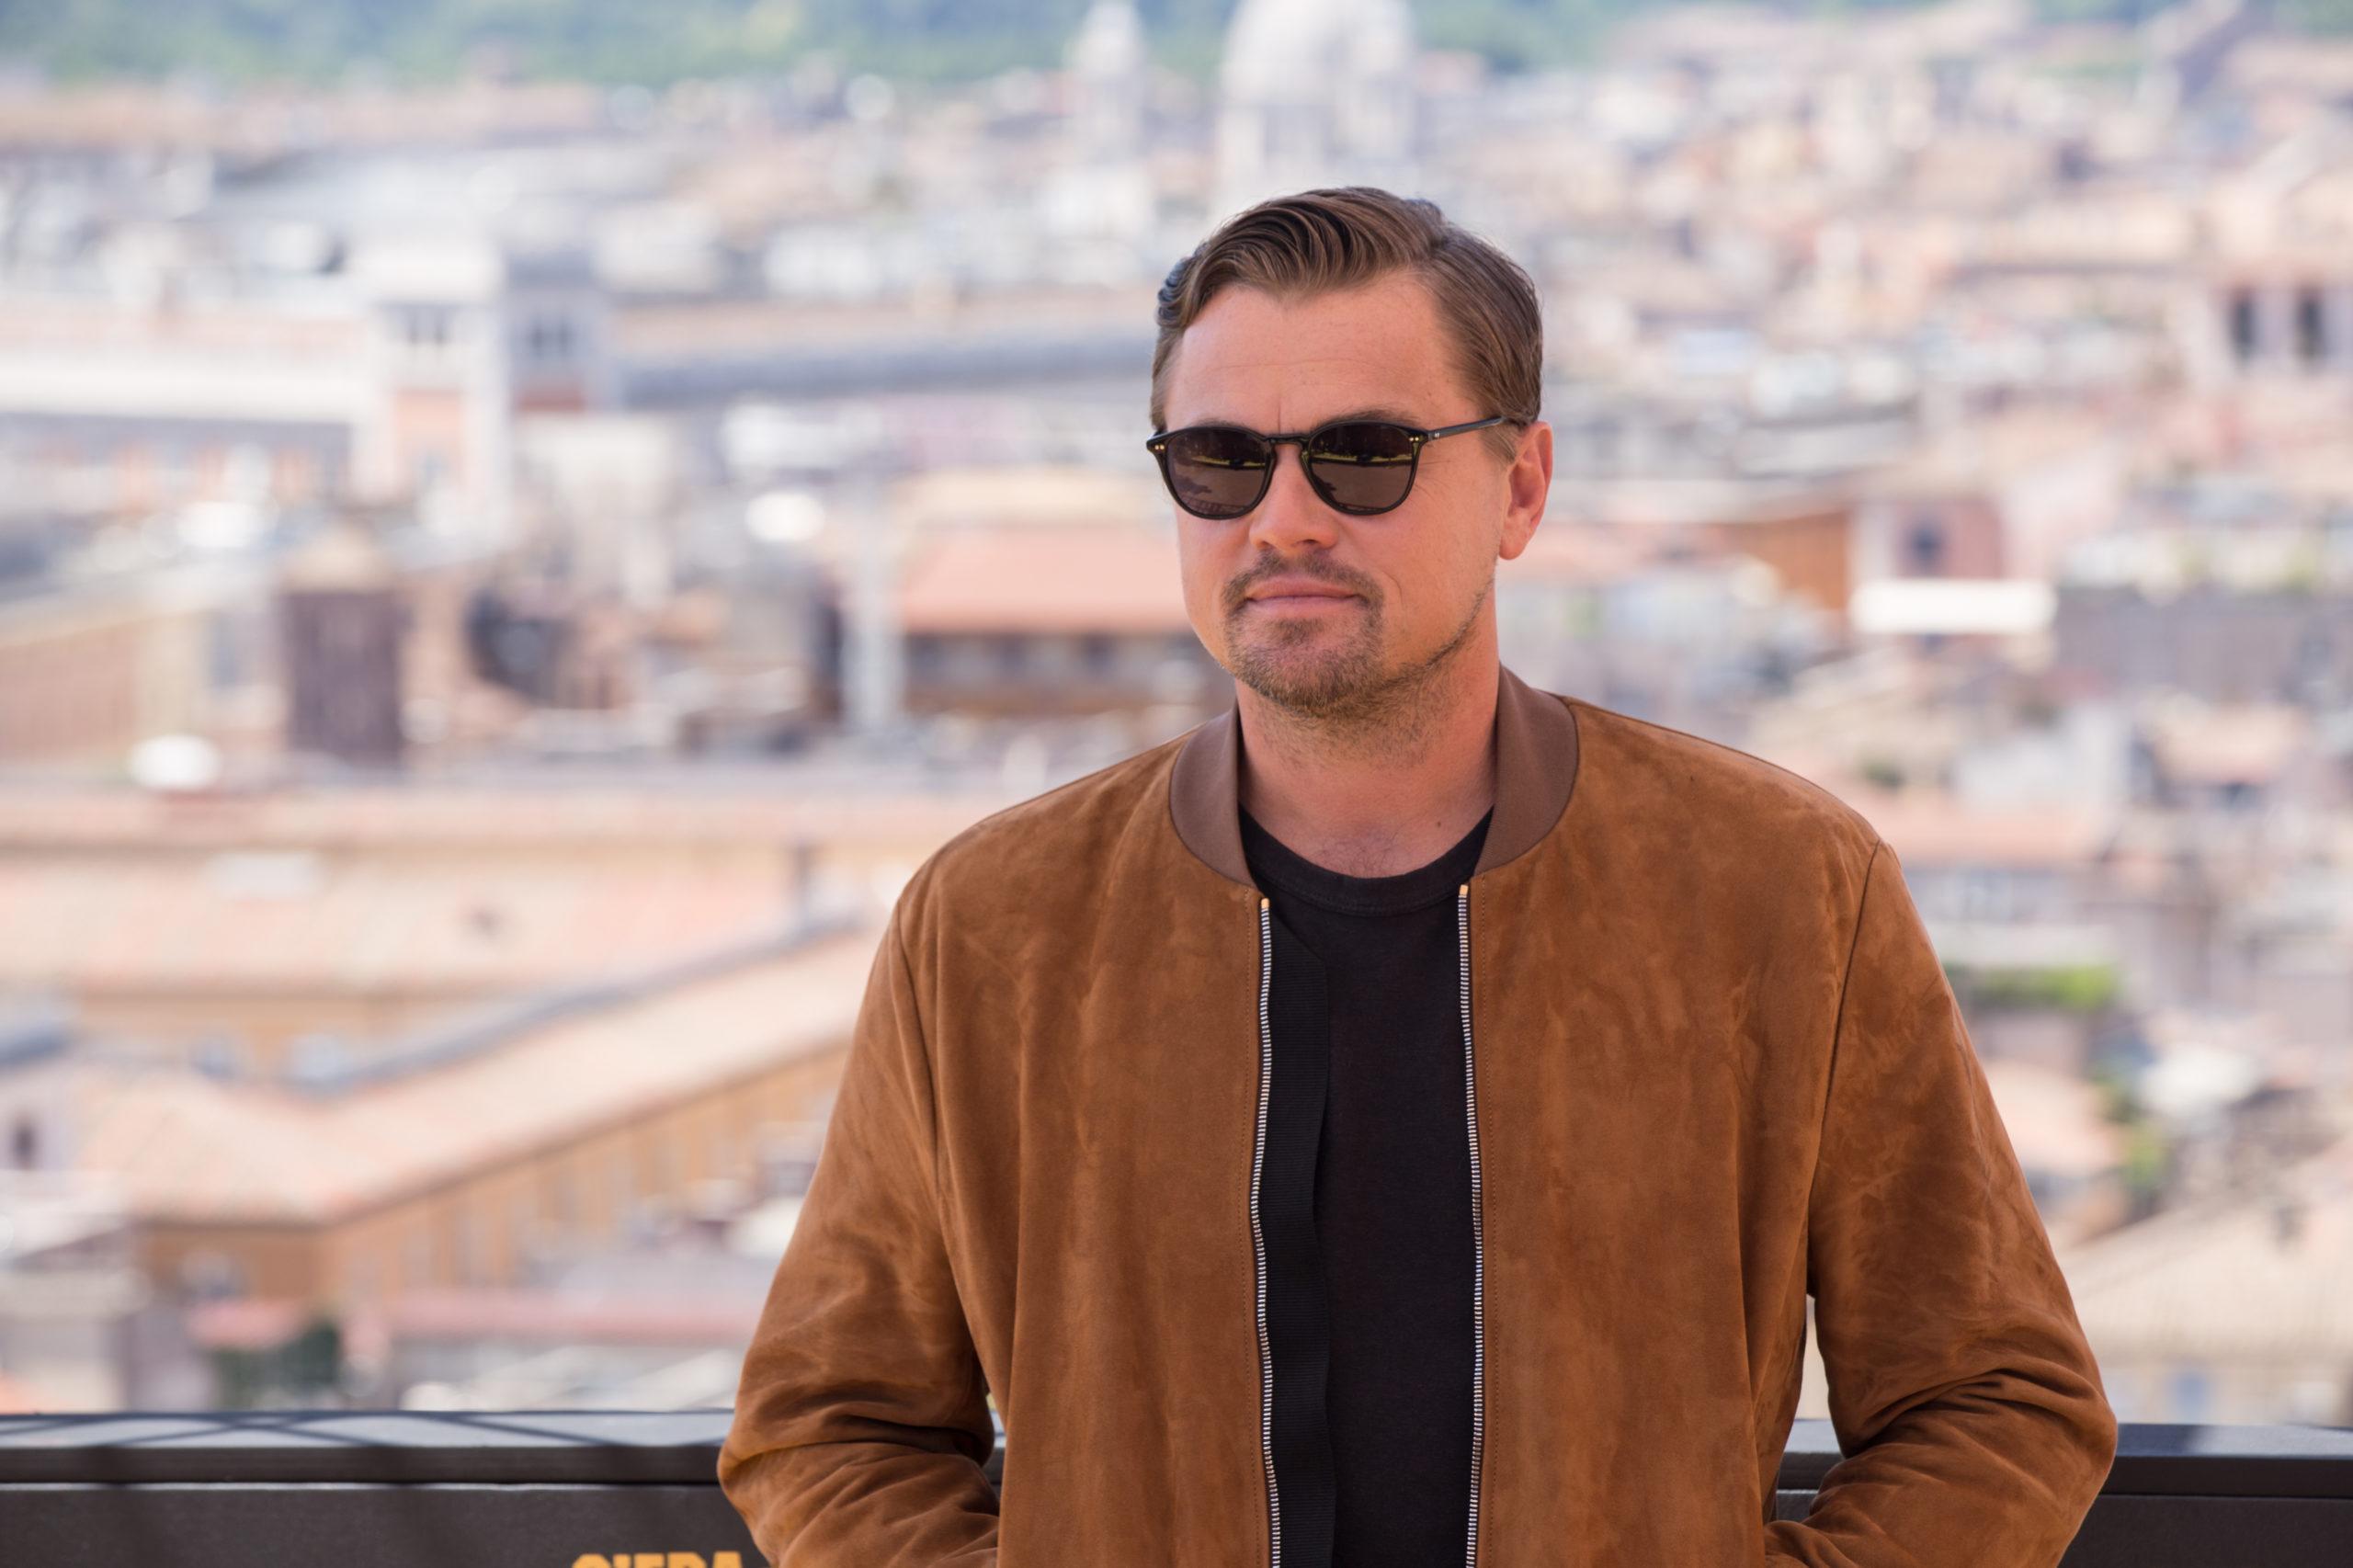 Vacanze italiane per DiCaprio